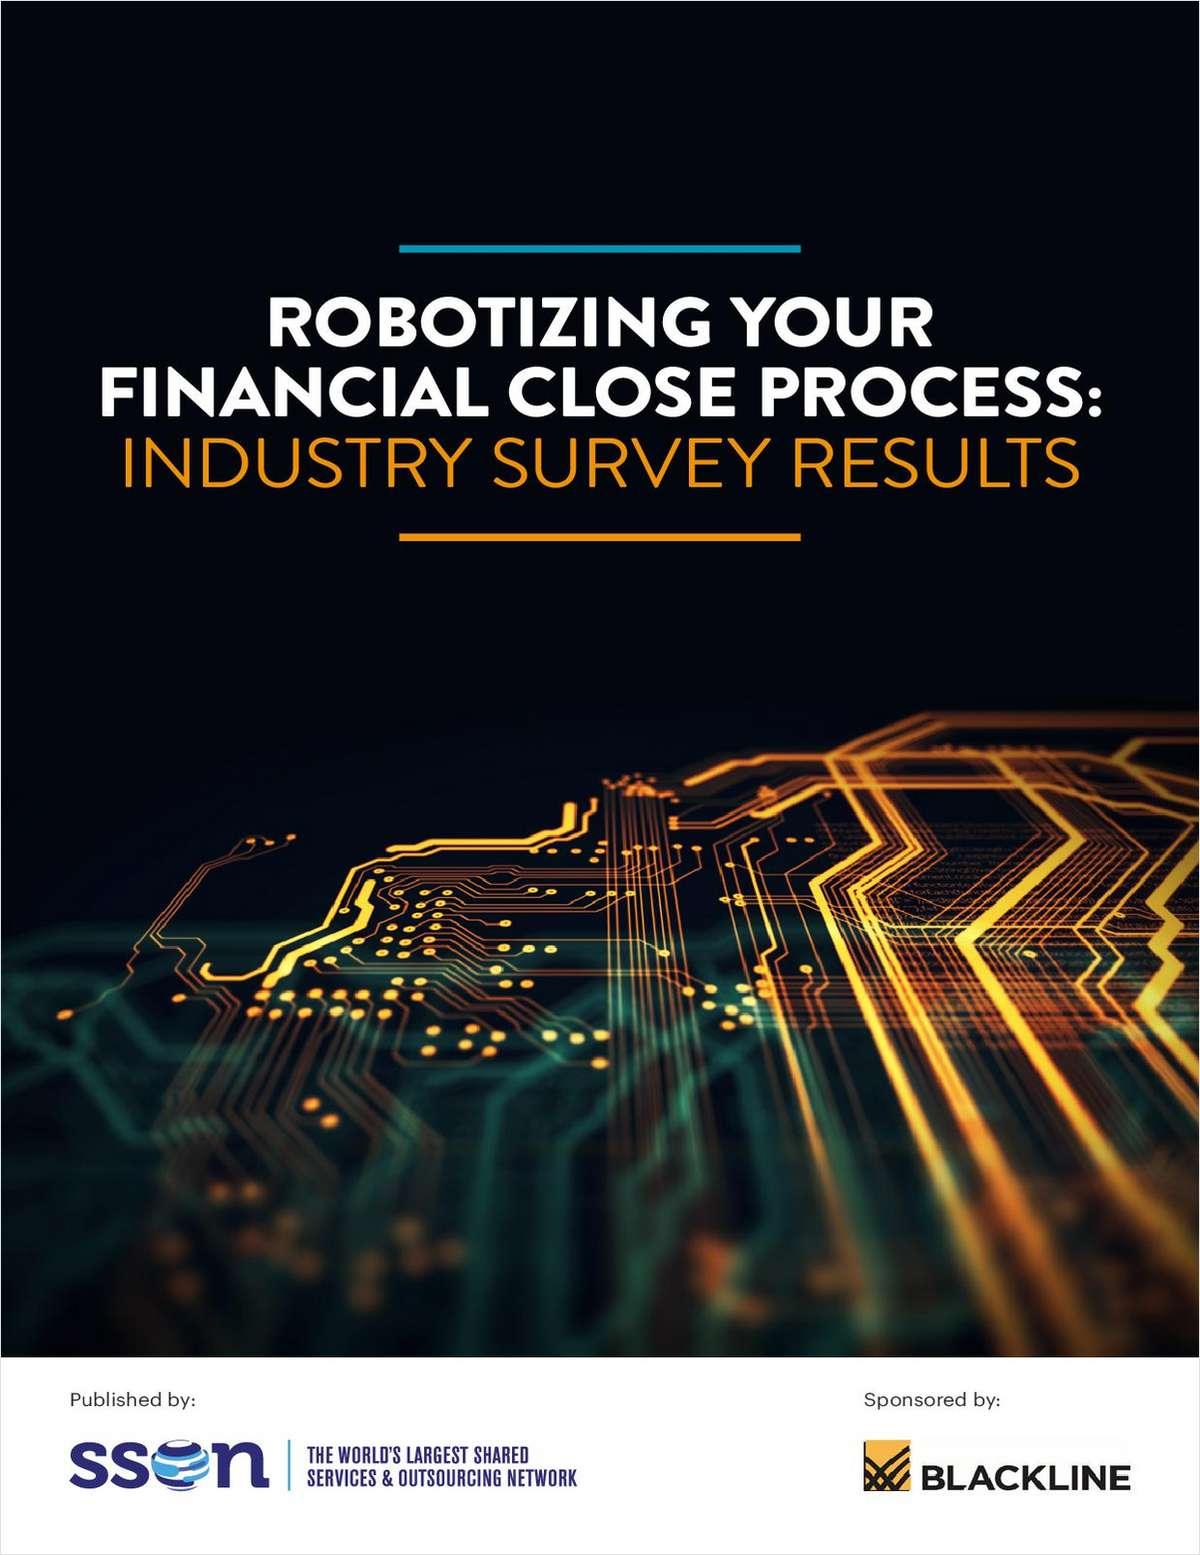 Robotizing Your Financial Close Process